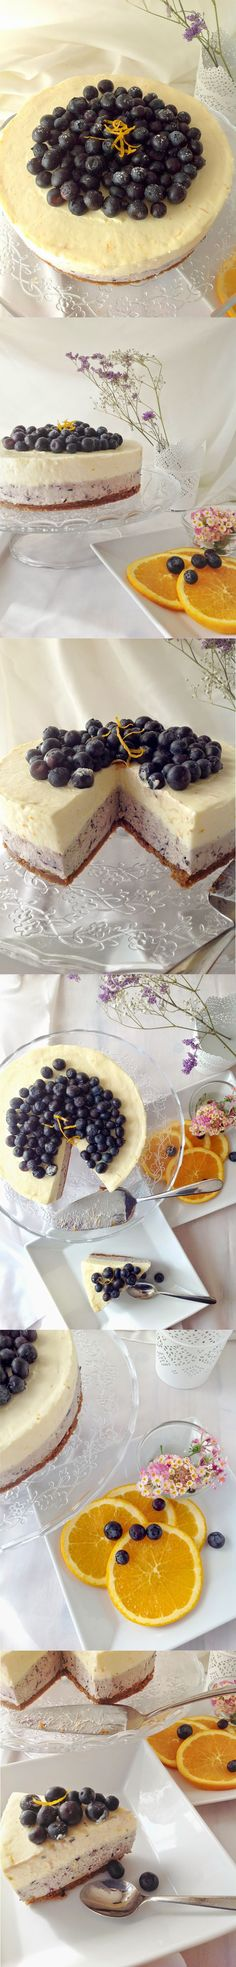 Cheesecake de naranja y arándanos / http://pattyscake-pbb.blogspot.com.es/